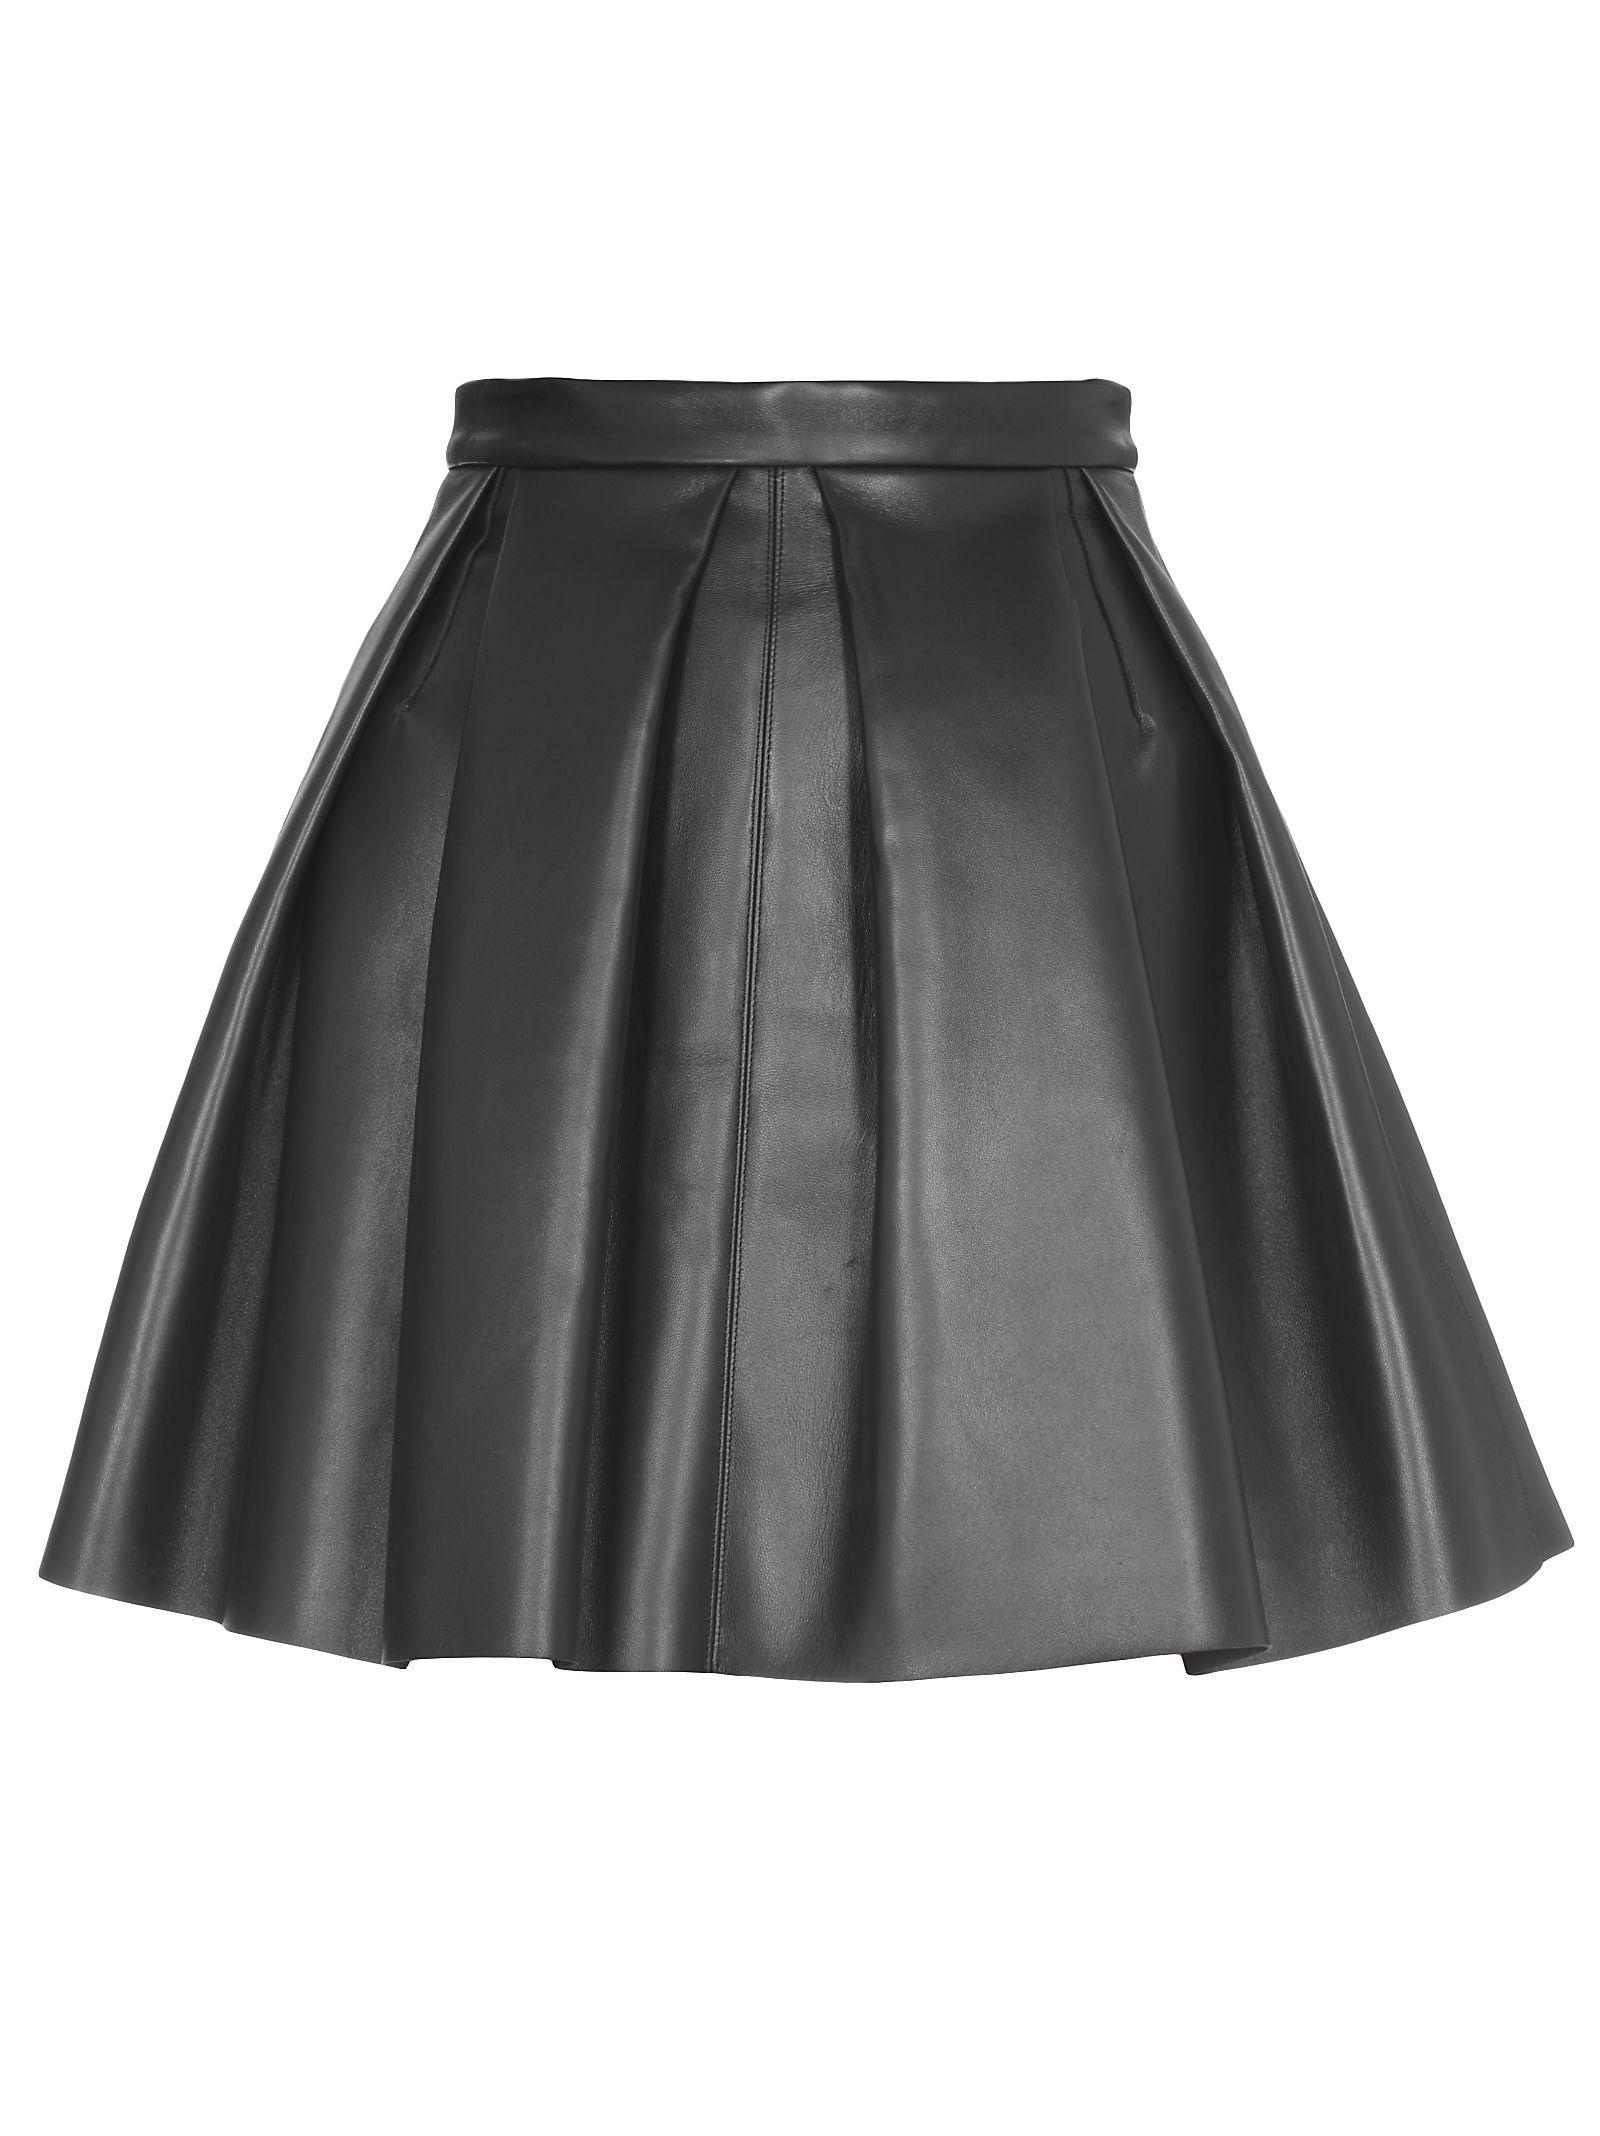 David Koma Leather Skirt In Black